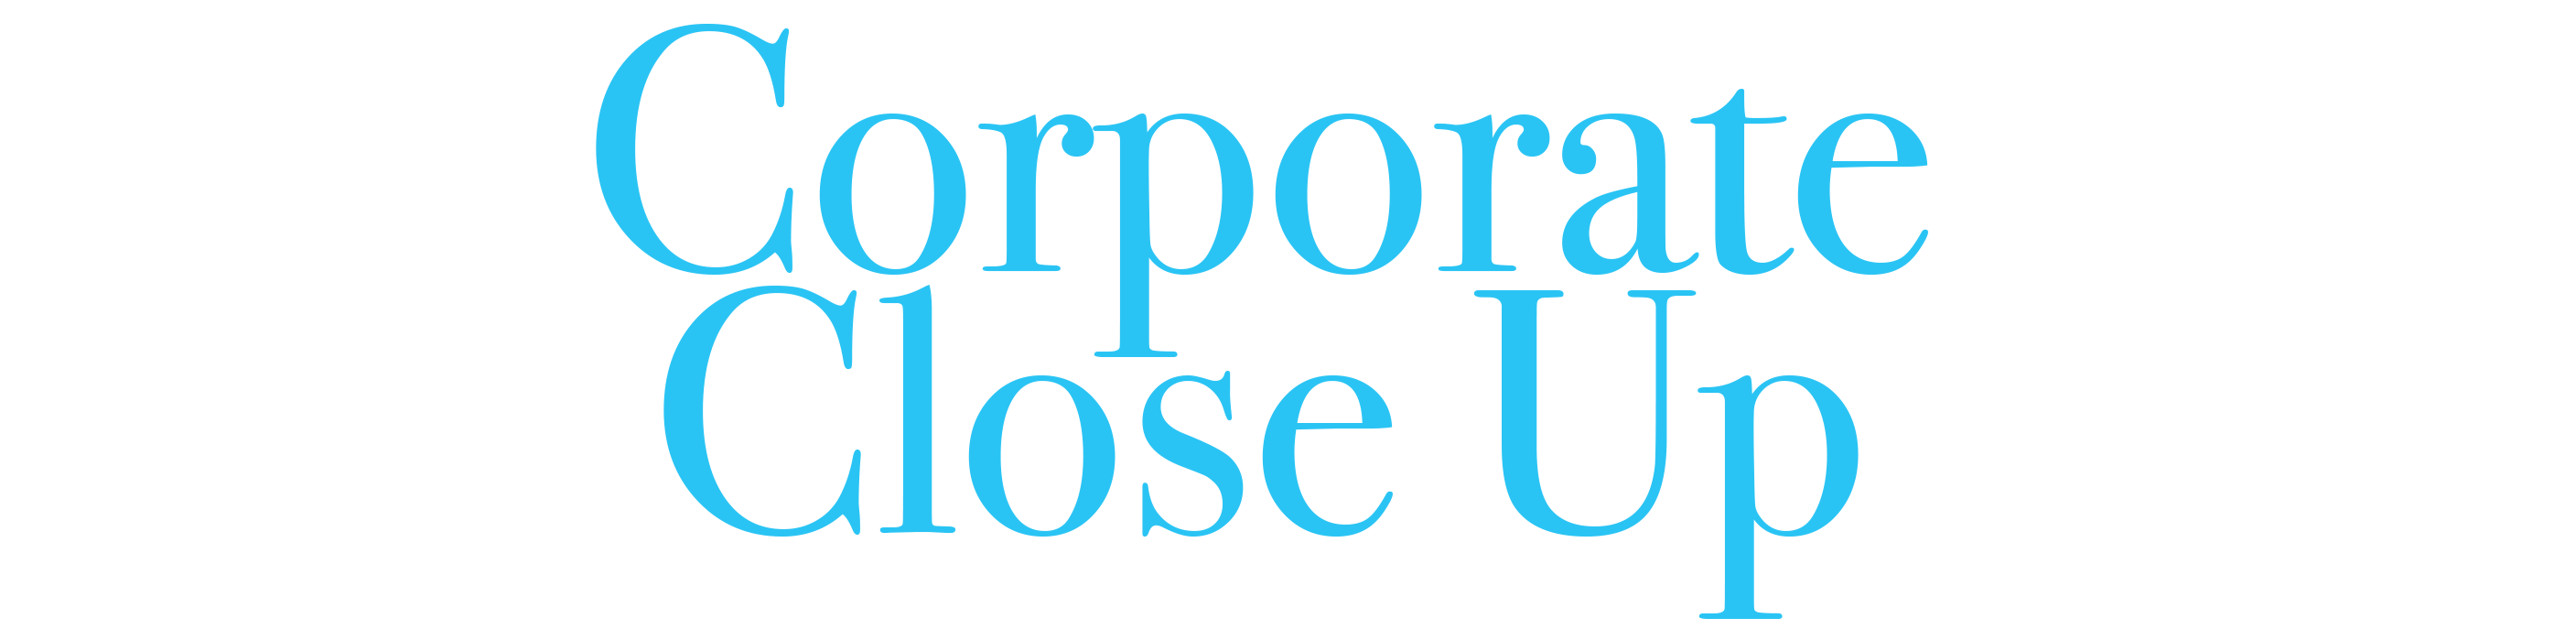 Corporate Close Up